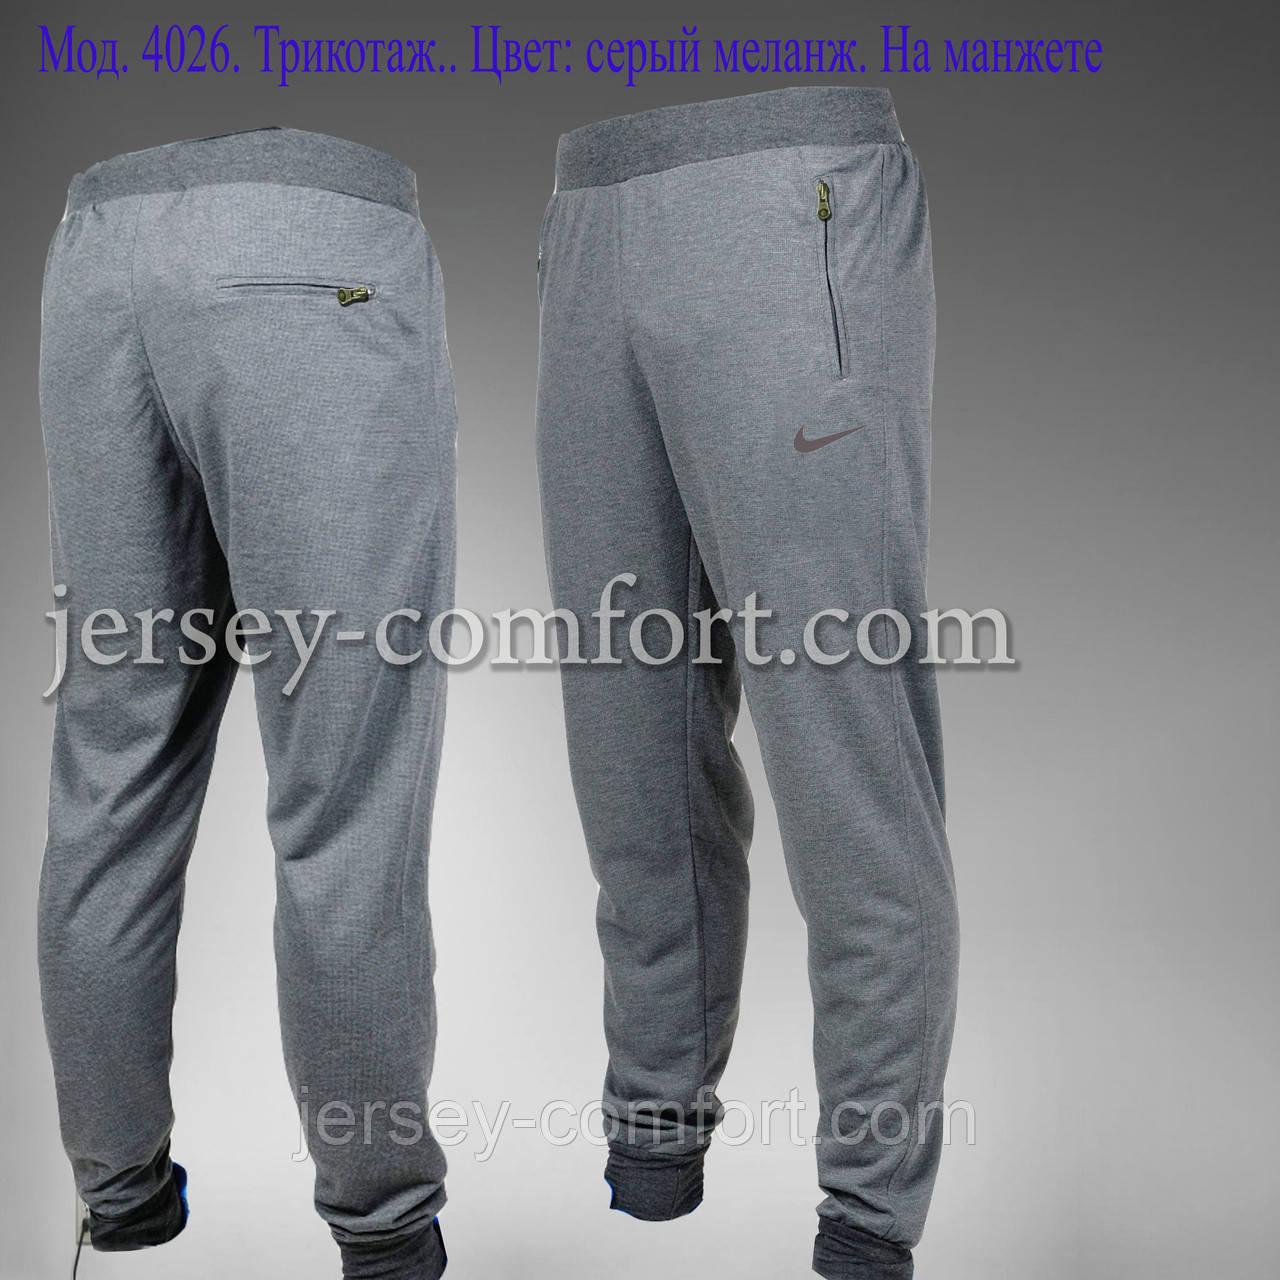 Спортивные брюки мужские на манжете. Трикотаж. 4 цвета. Мод. 4026.